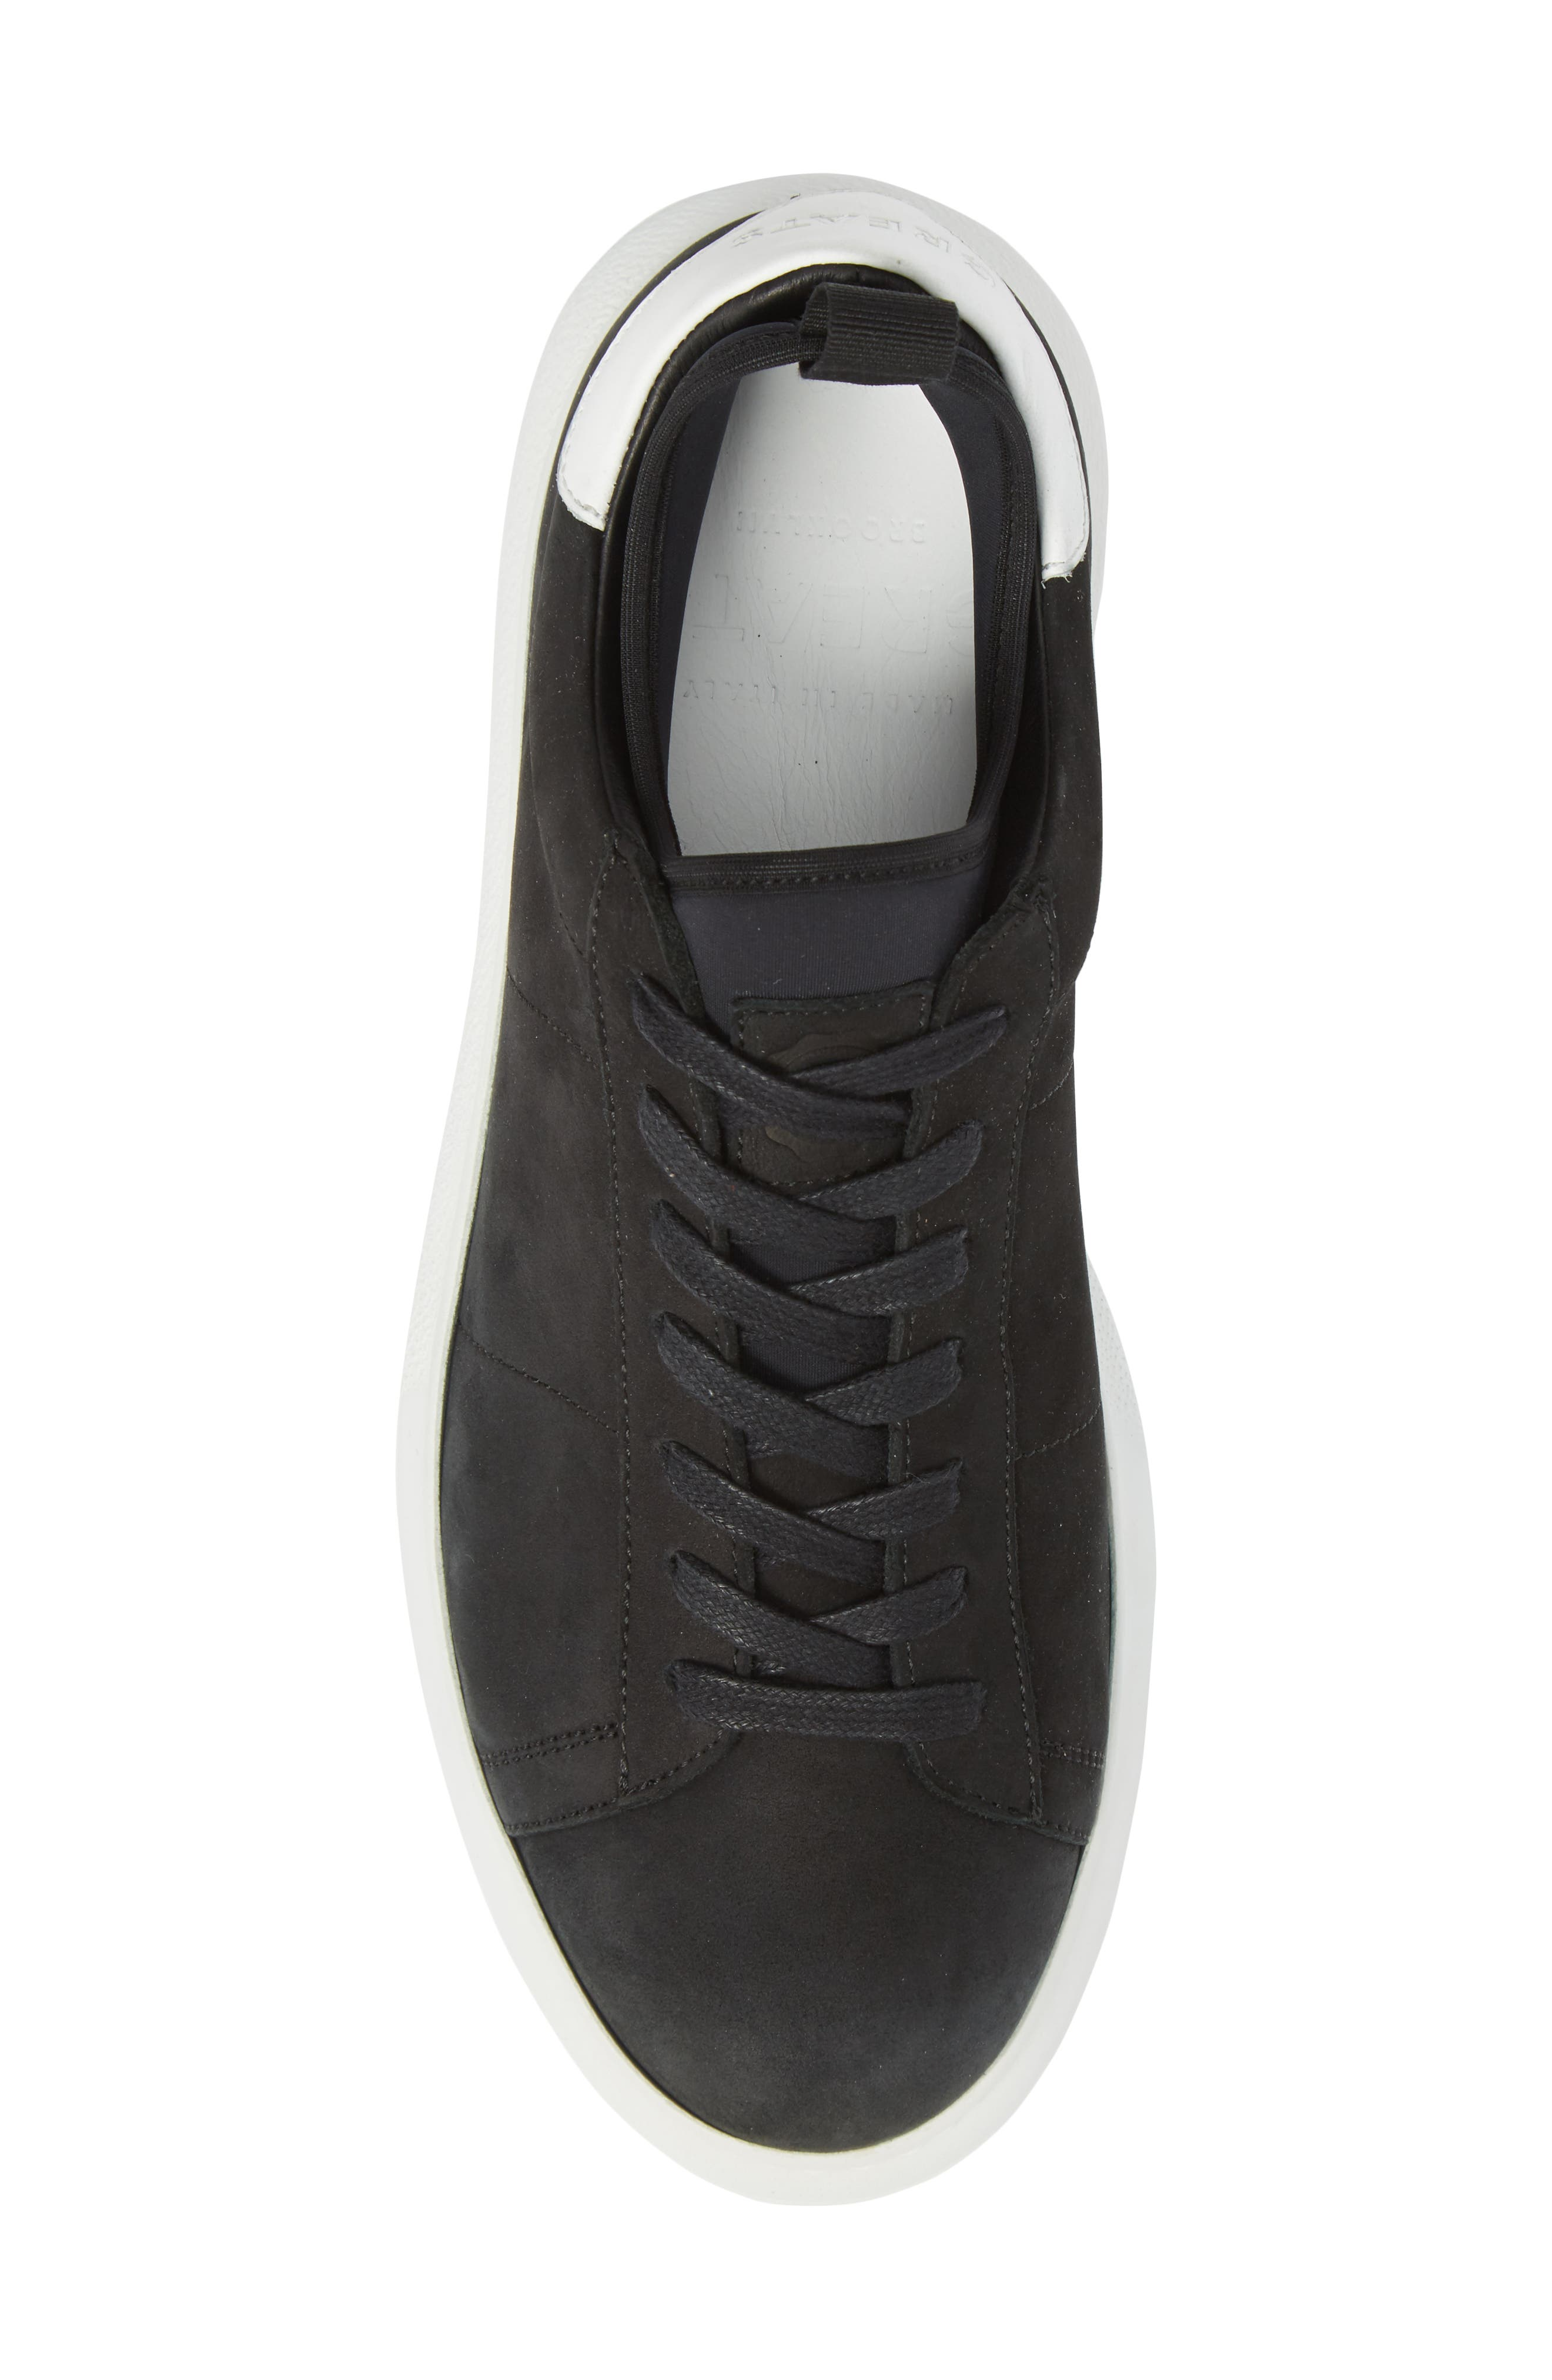 Alta Low Top Sneaker,                             Alternate thumbnail 5, color,                             BLACK NUBUCK LEATHER